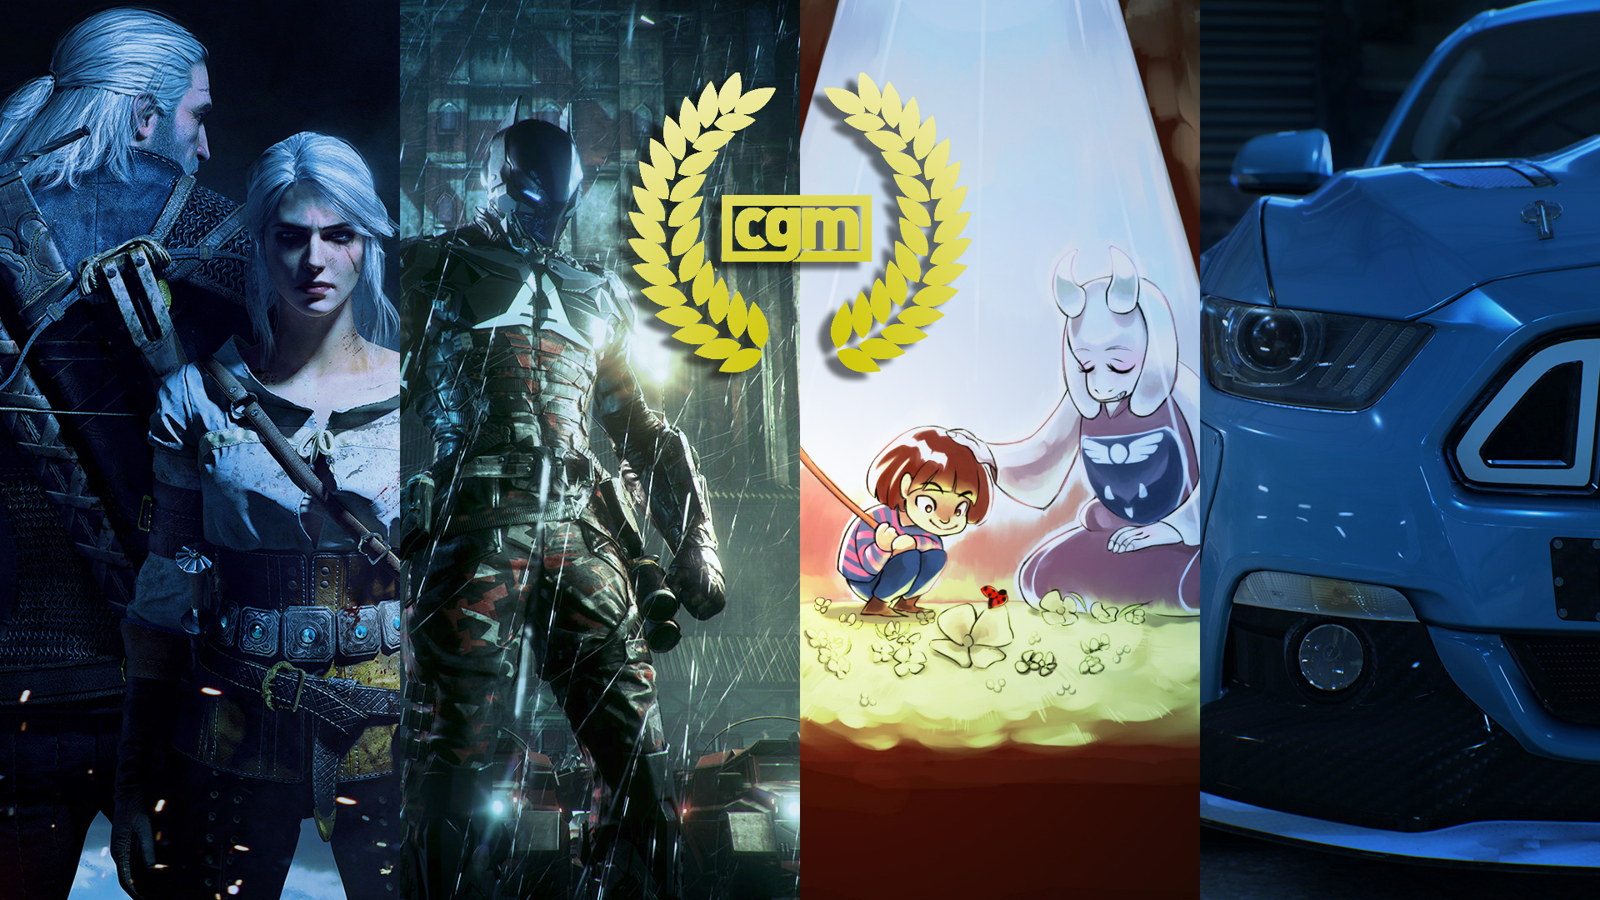 CGMagazine's 2015 Game of the Year Awards